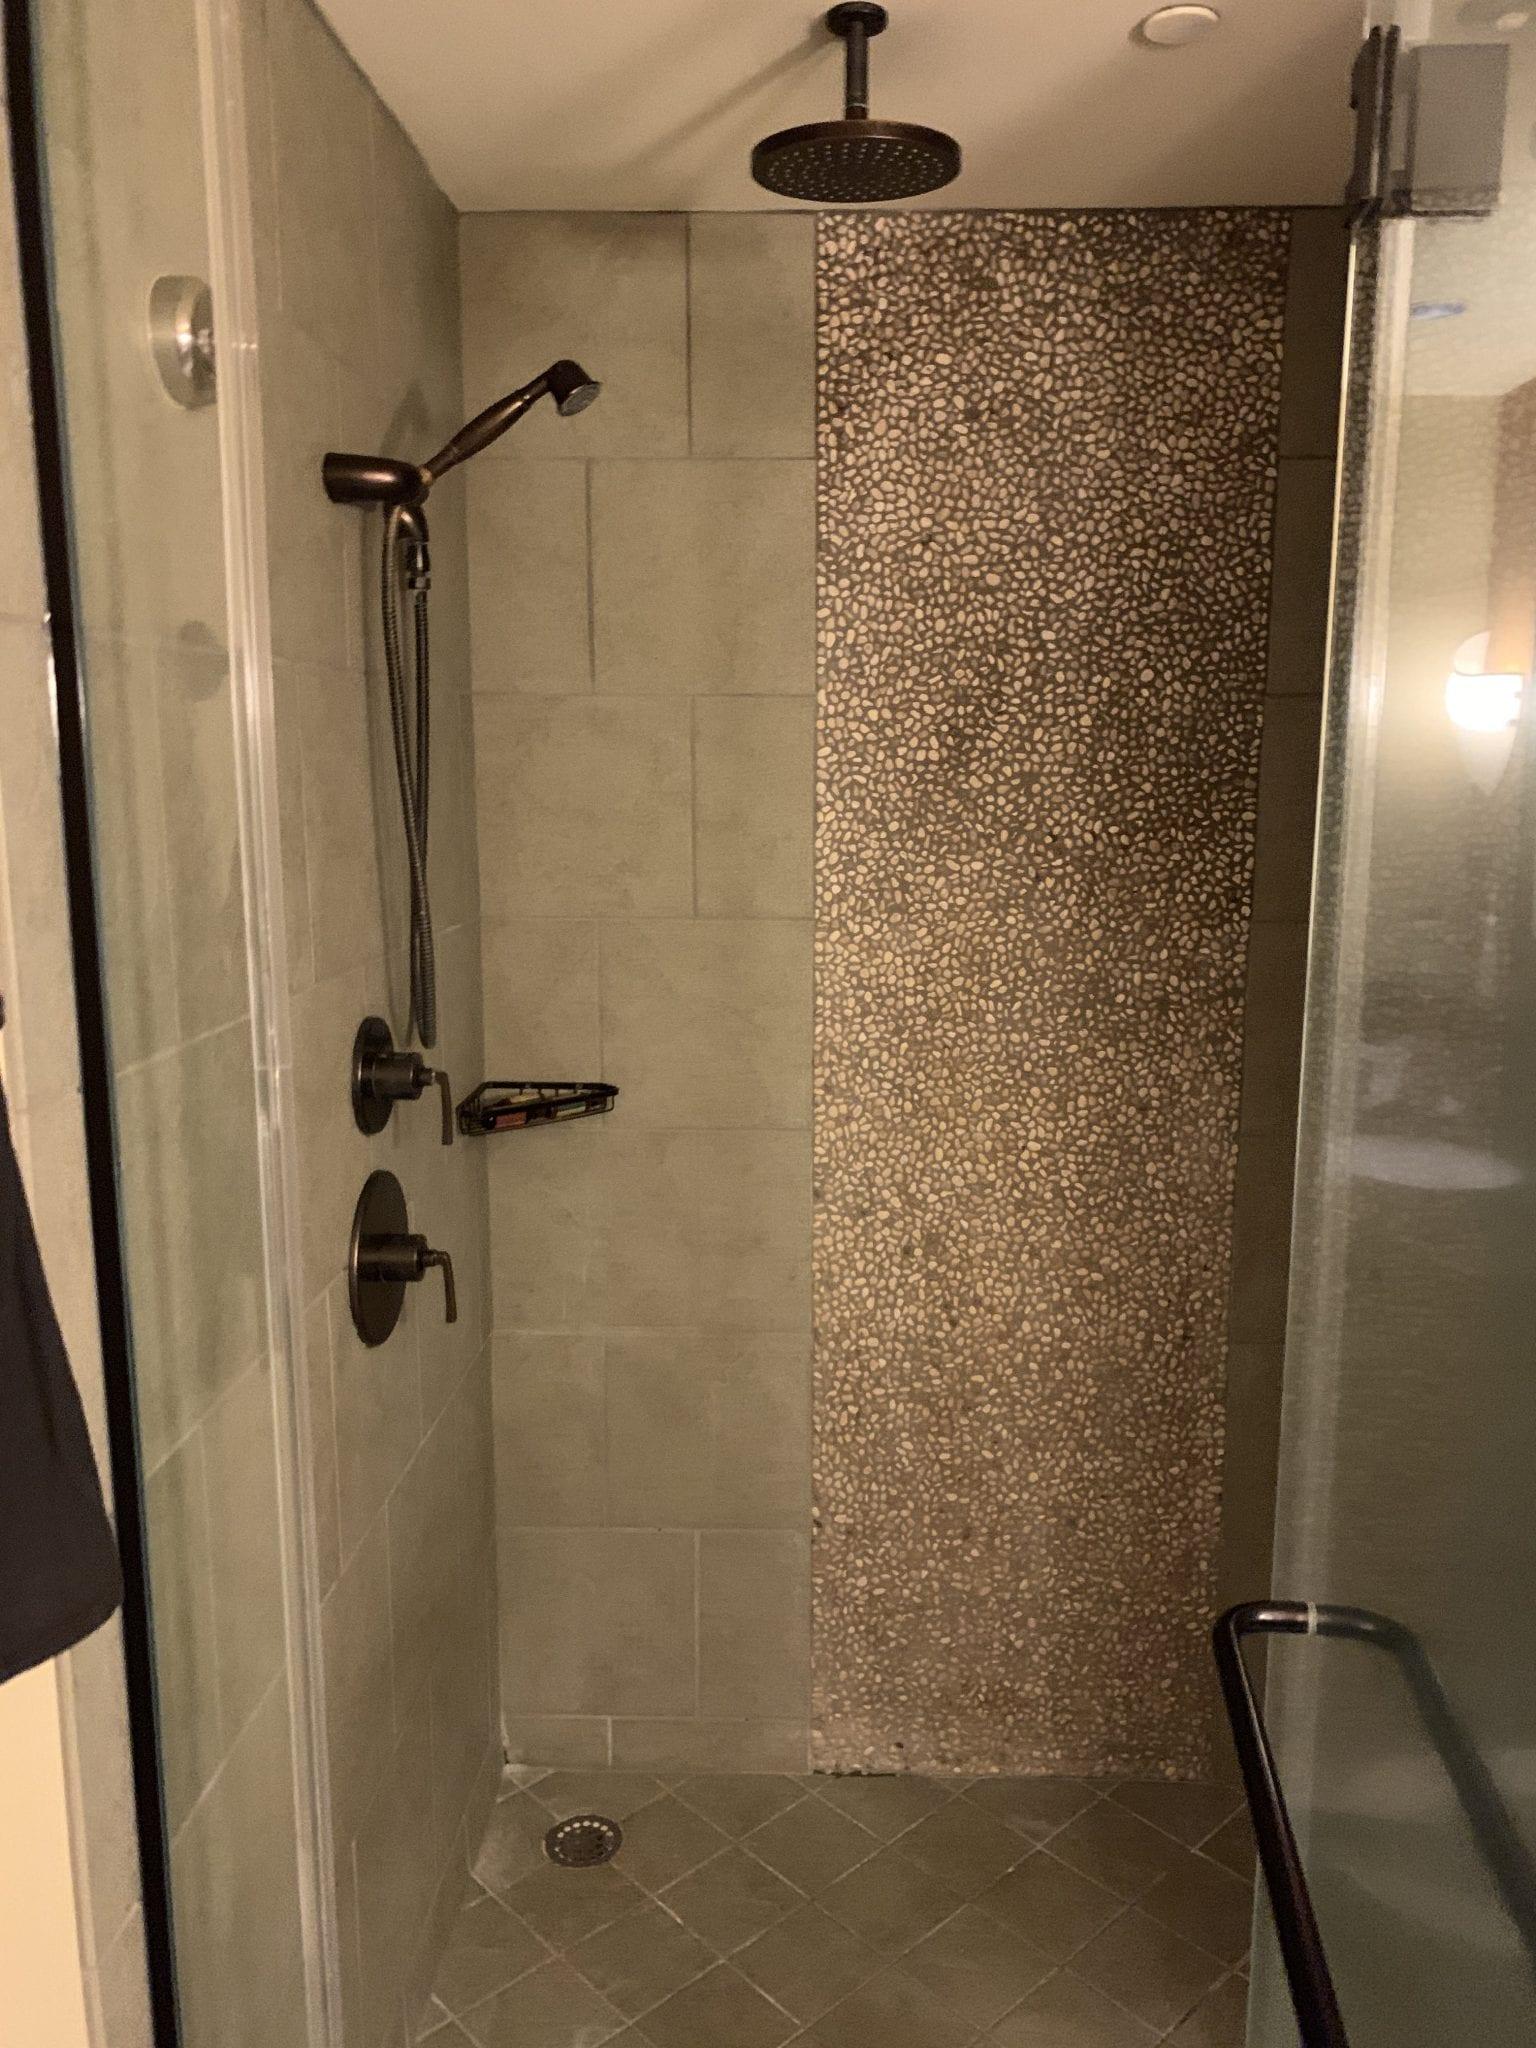 Shower at Disney Aulani - DVC Rental